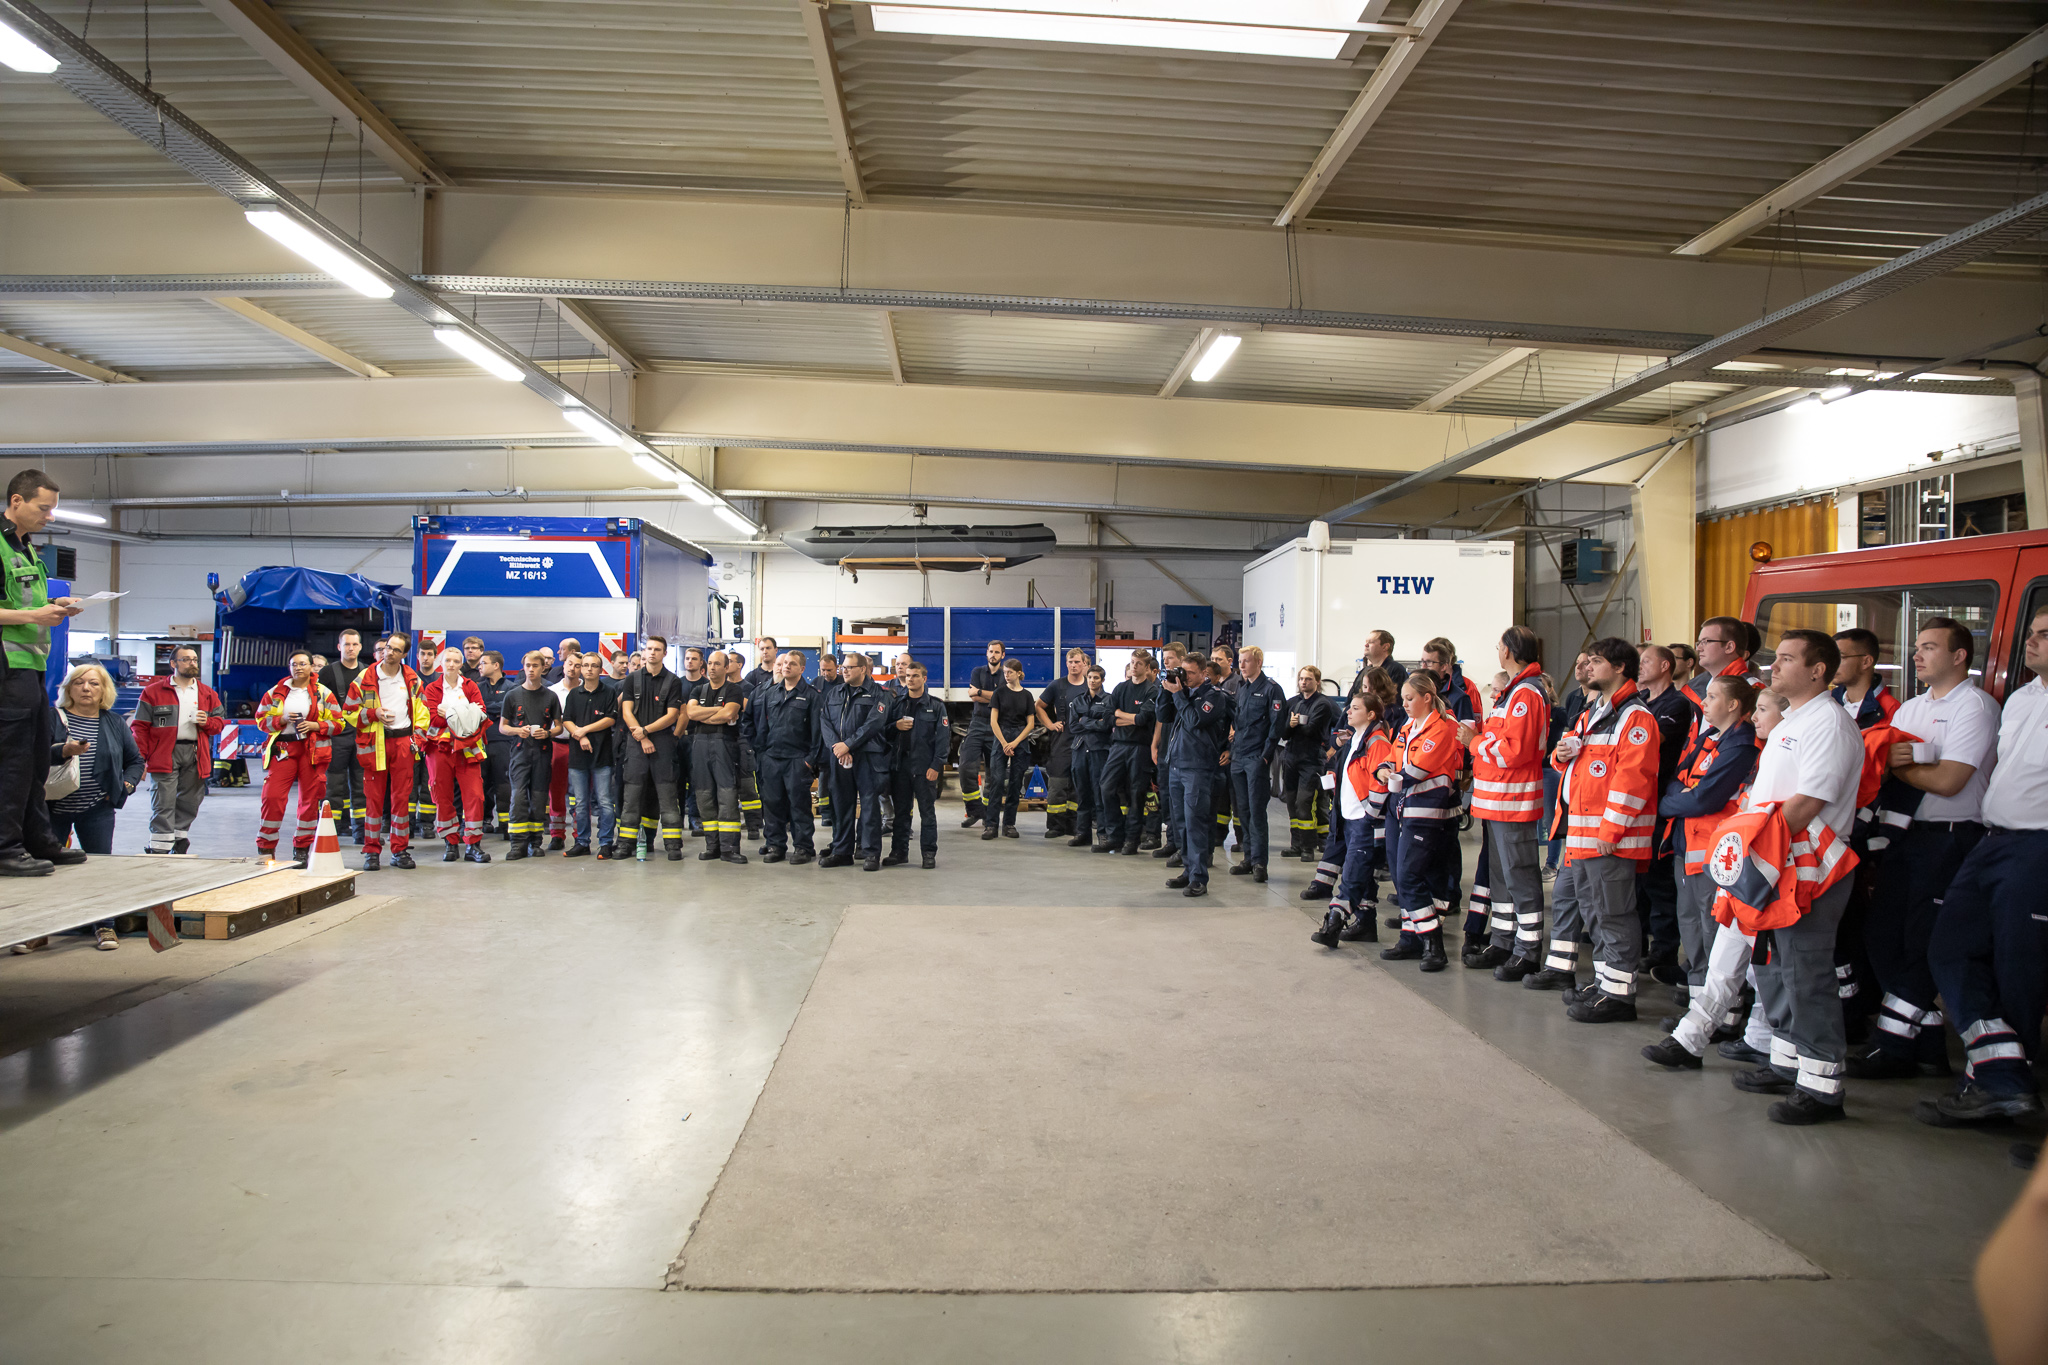 FeuerwehrSim 2019 Begrung-2